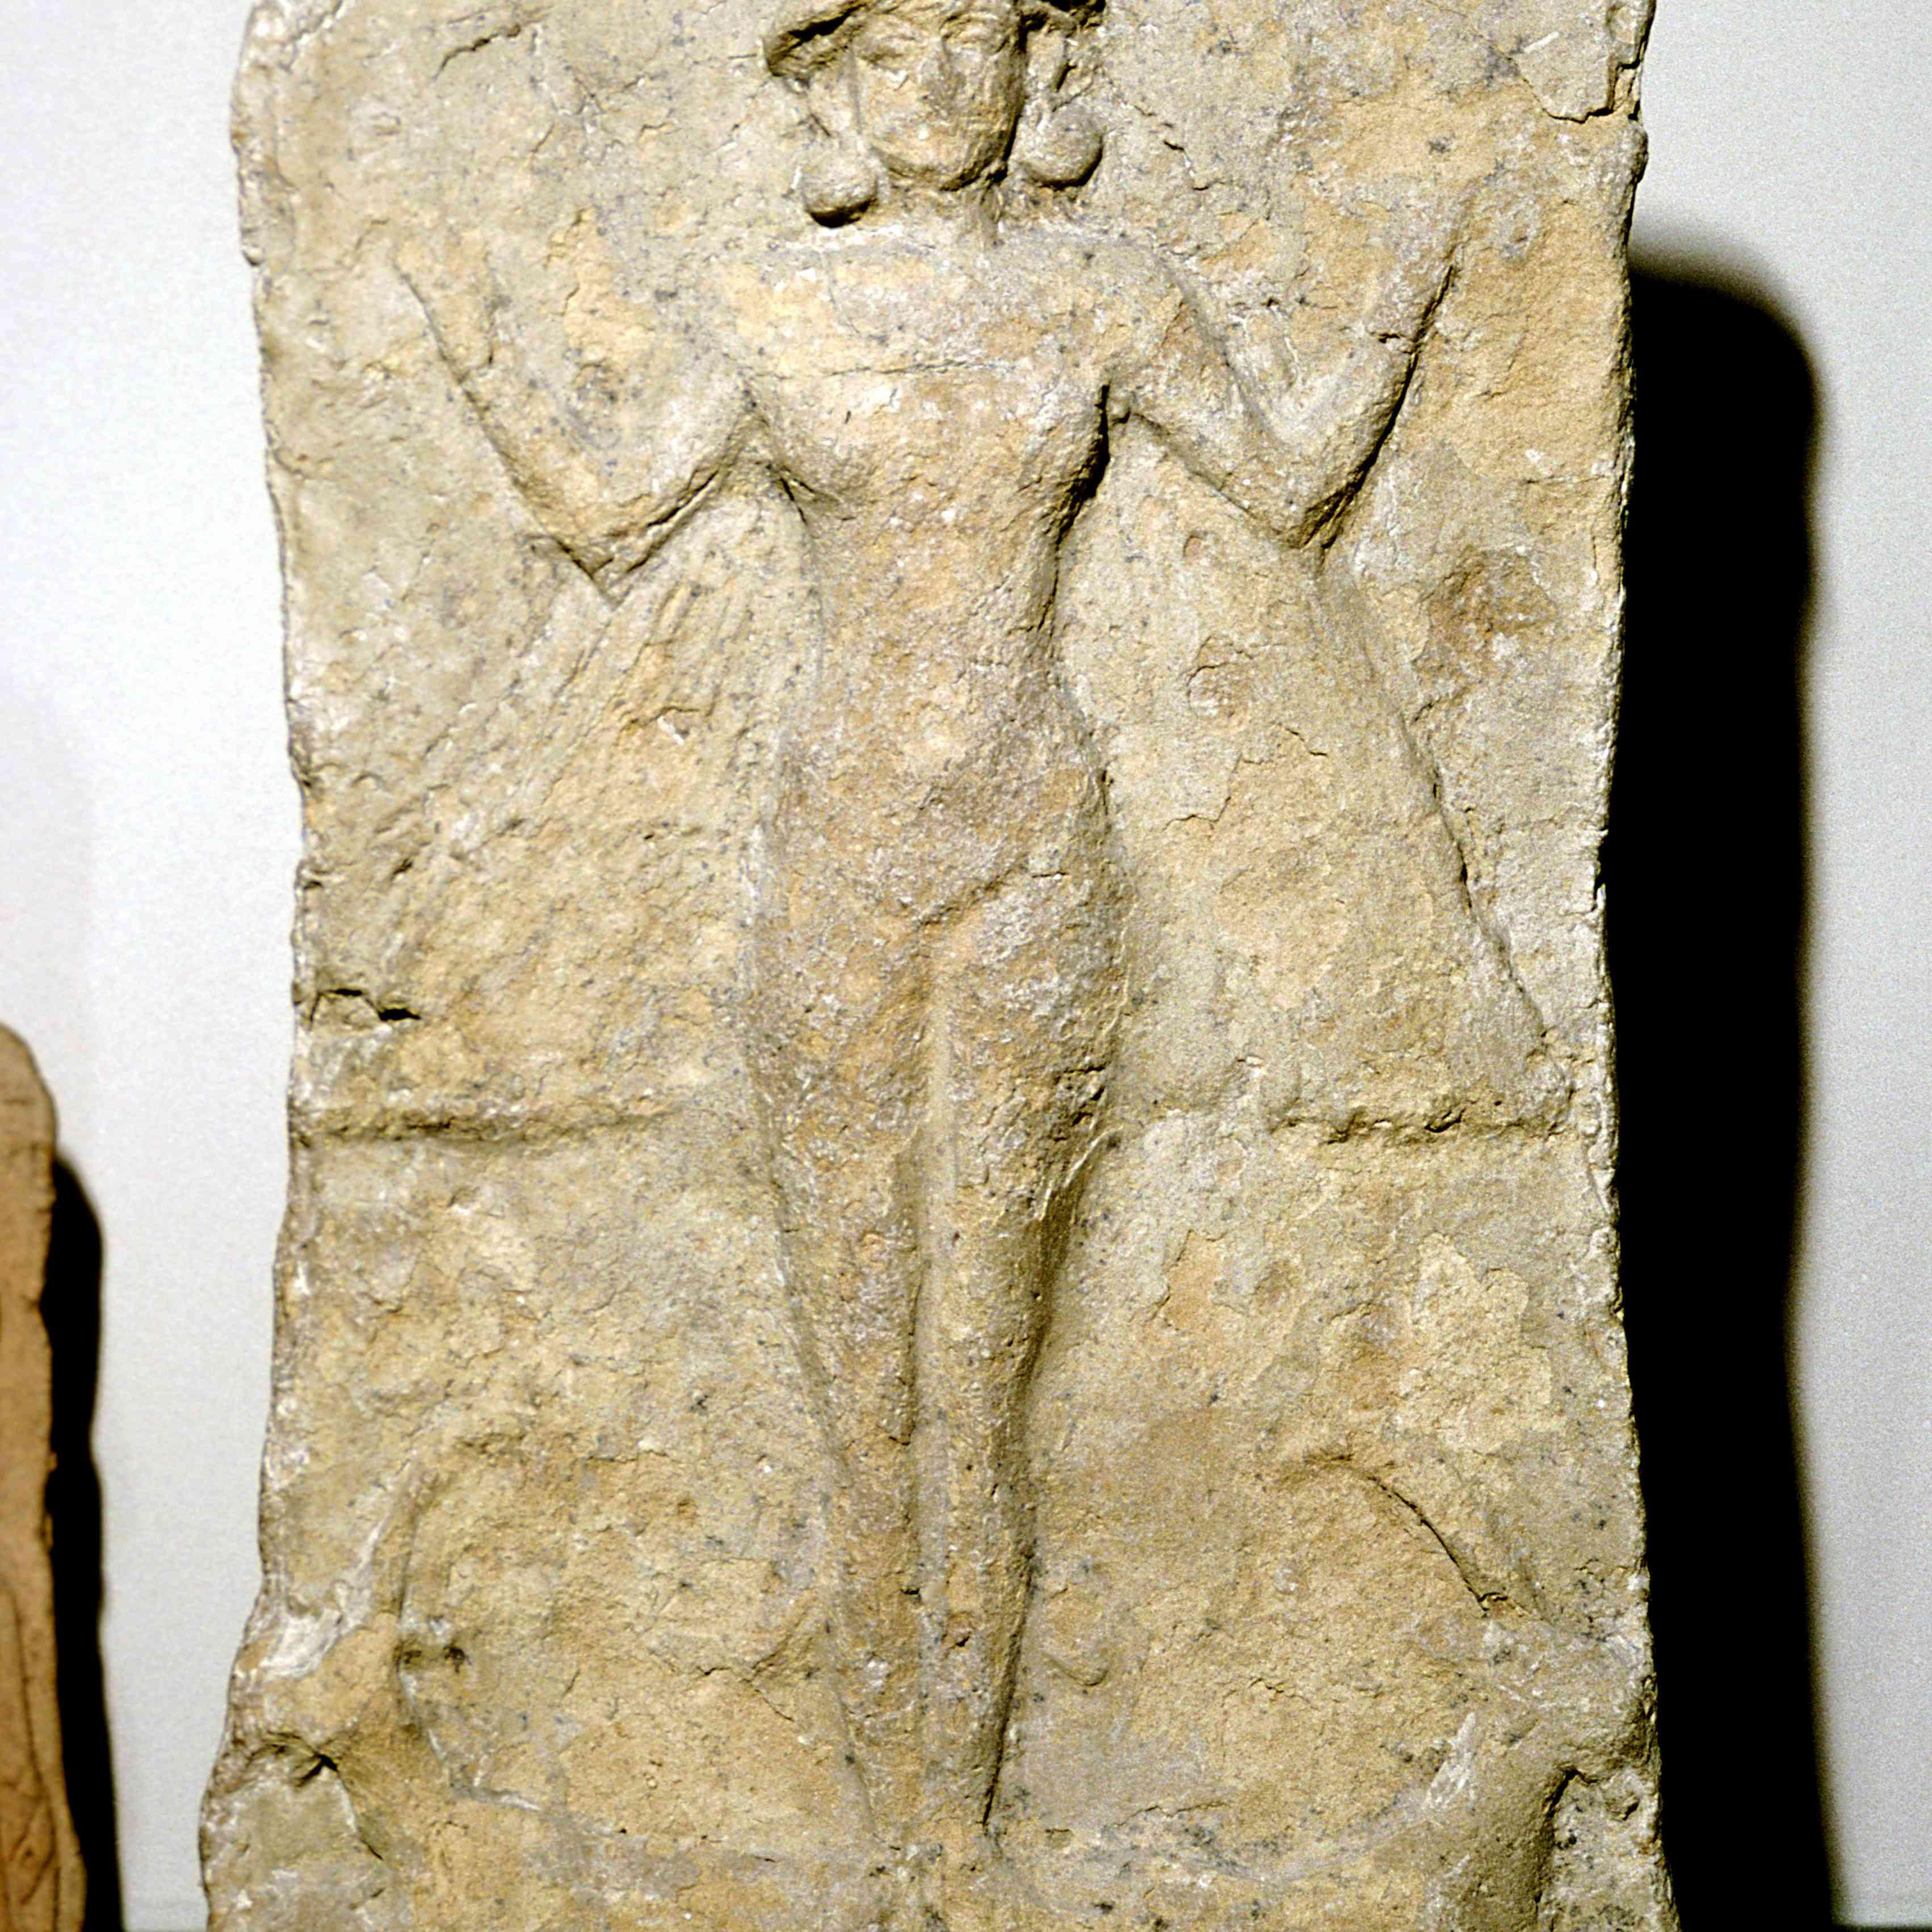 Inanna, Goddess War, Sex, and Justice